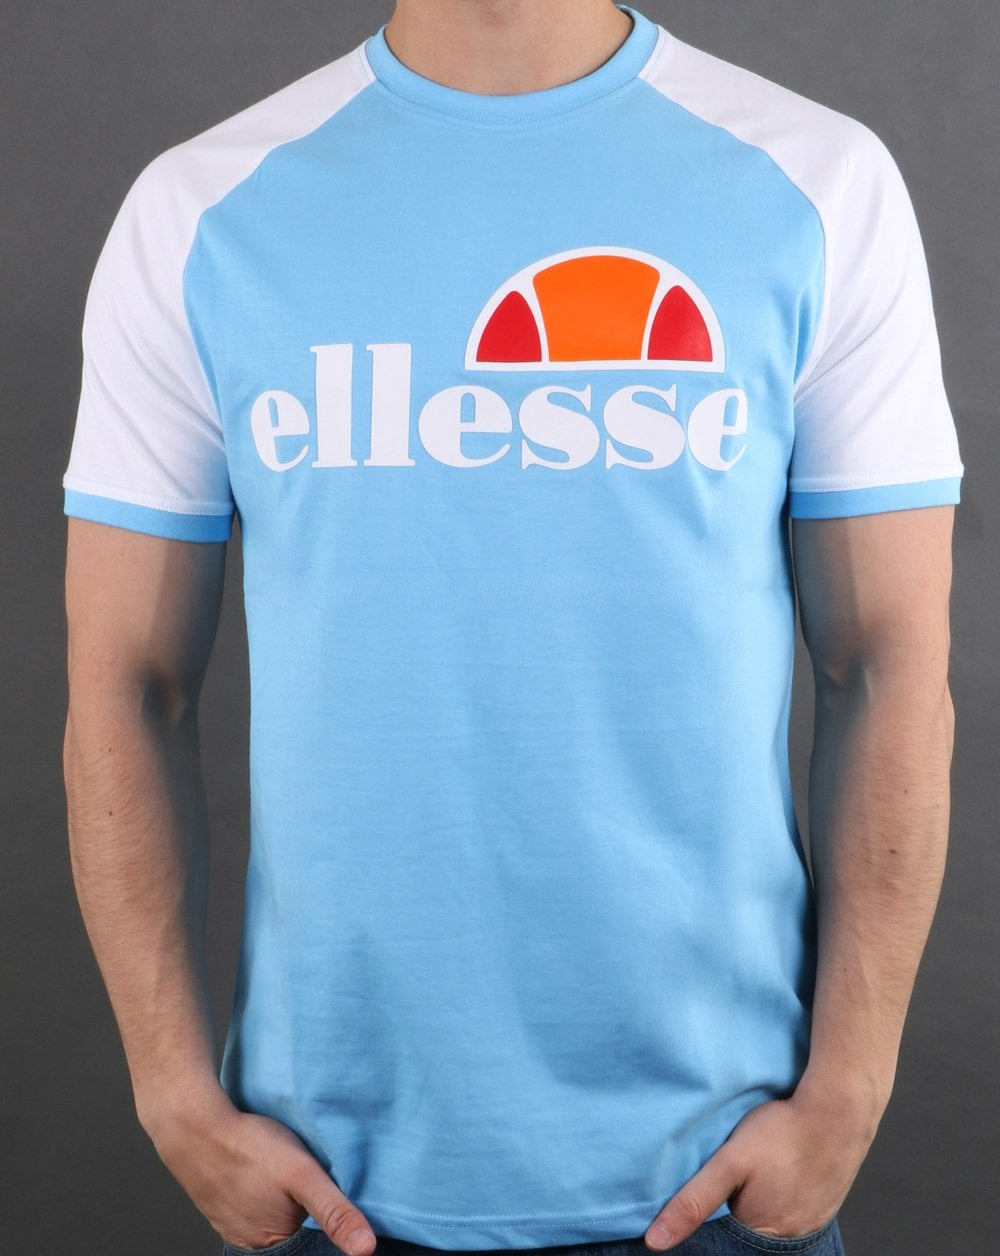 d9a48693 Ellesse Cassina T Shirt White/light Blue